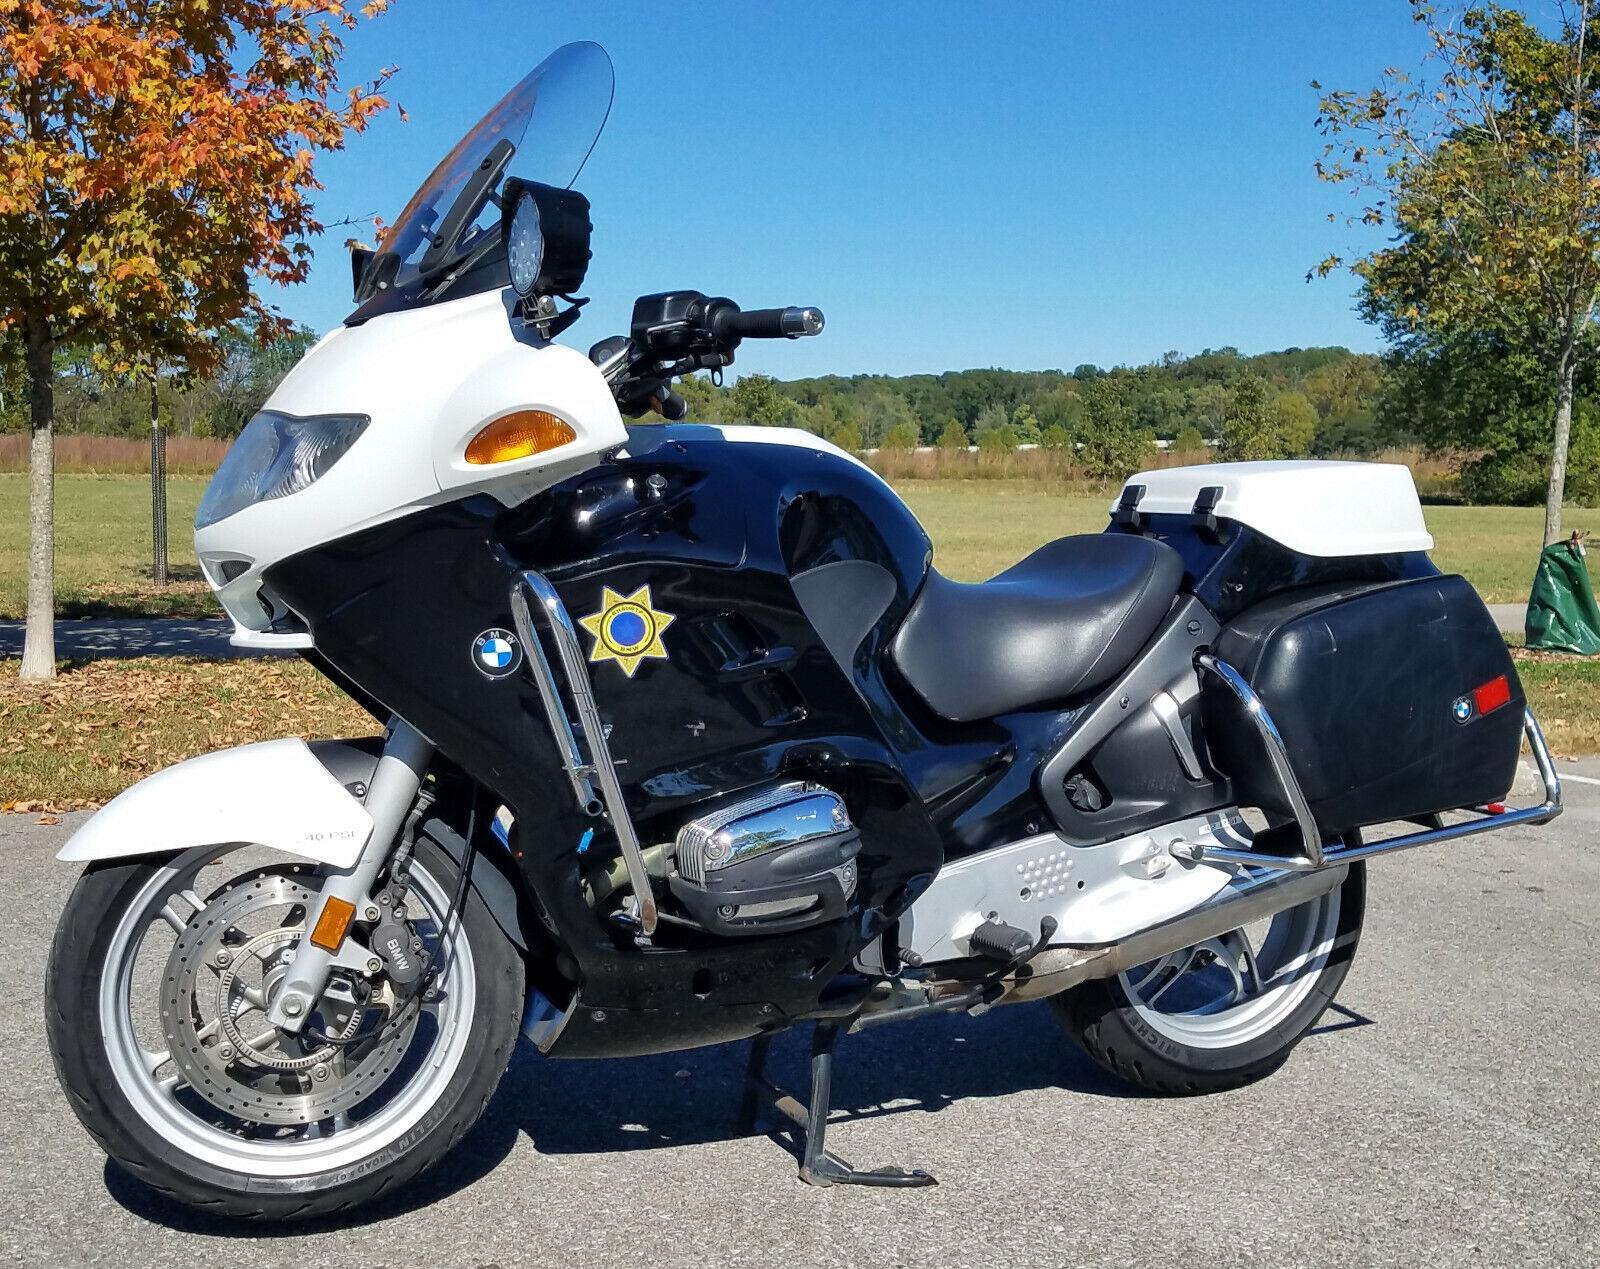 2002 BMW R1150RTP Police Bike 43,725 Miles & in Nice Shape